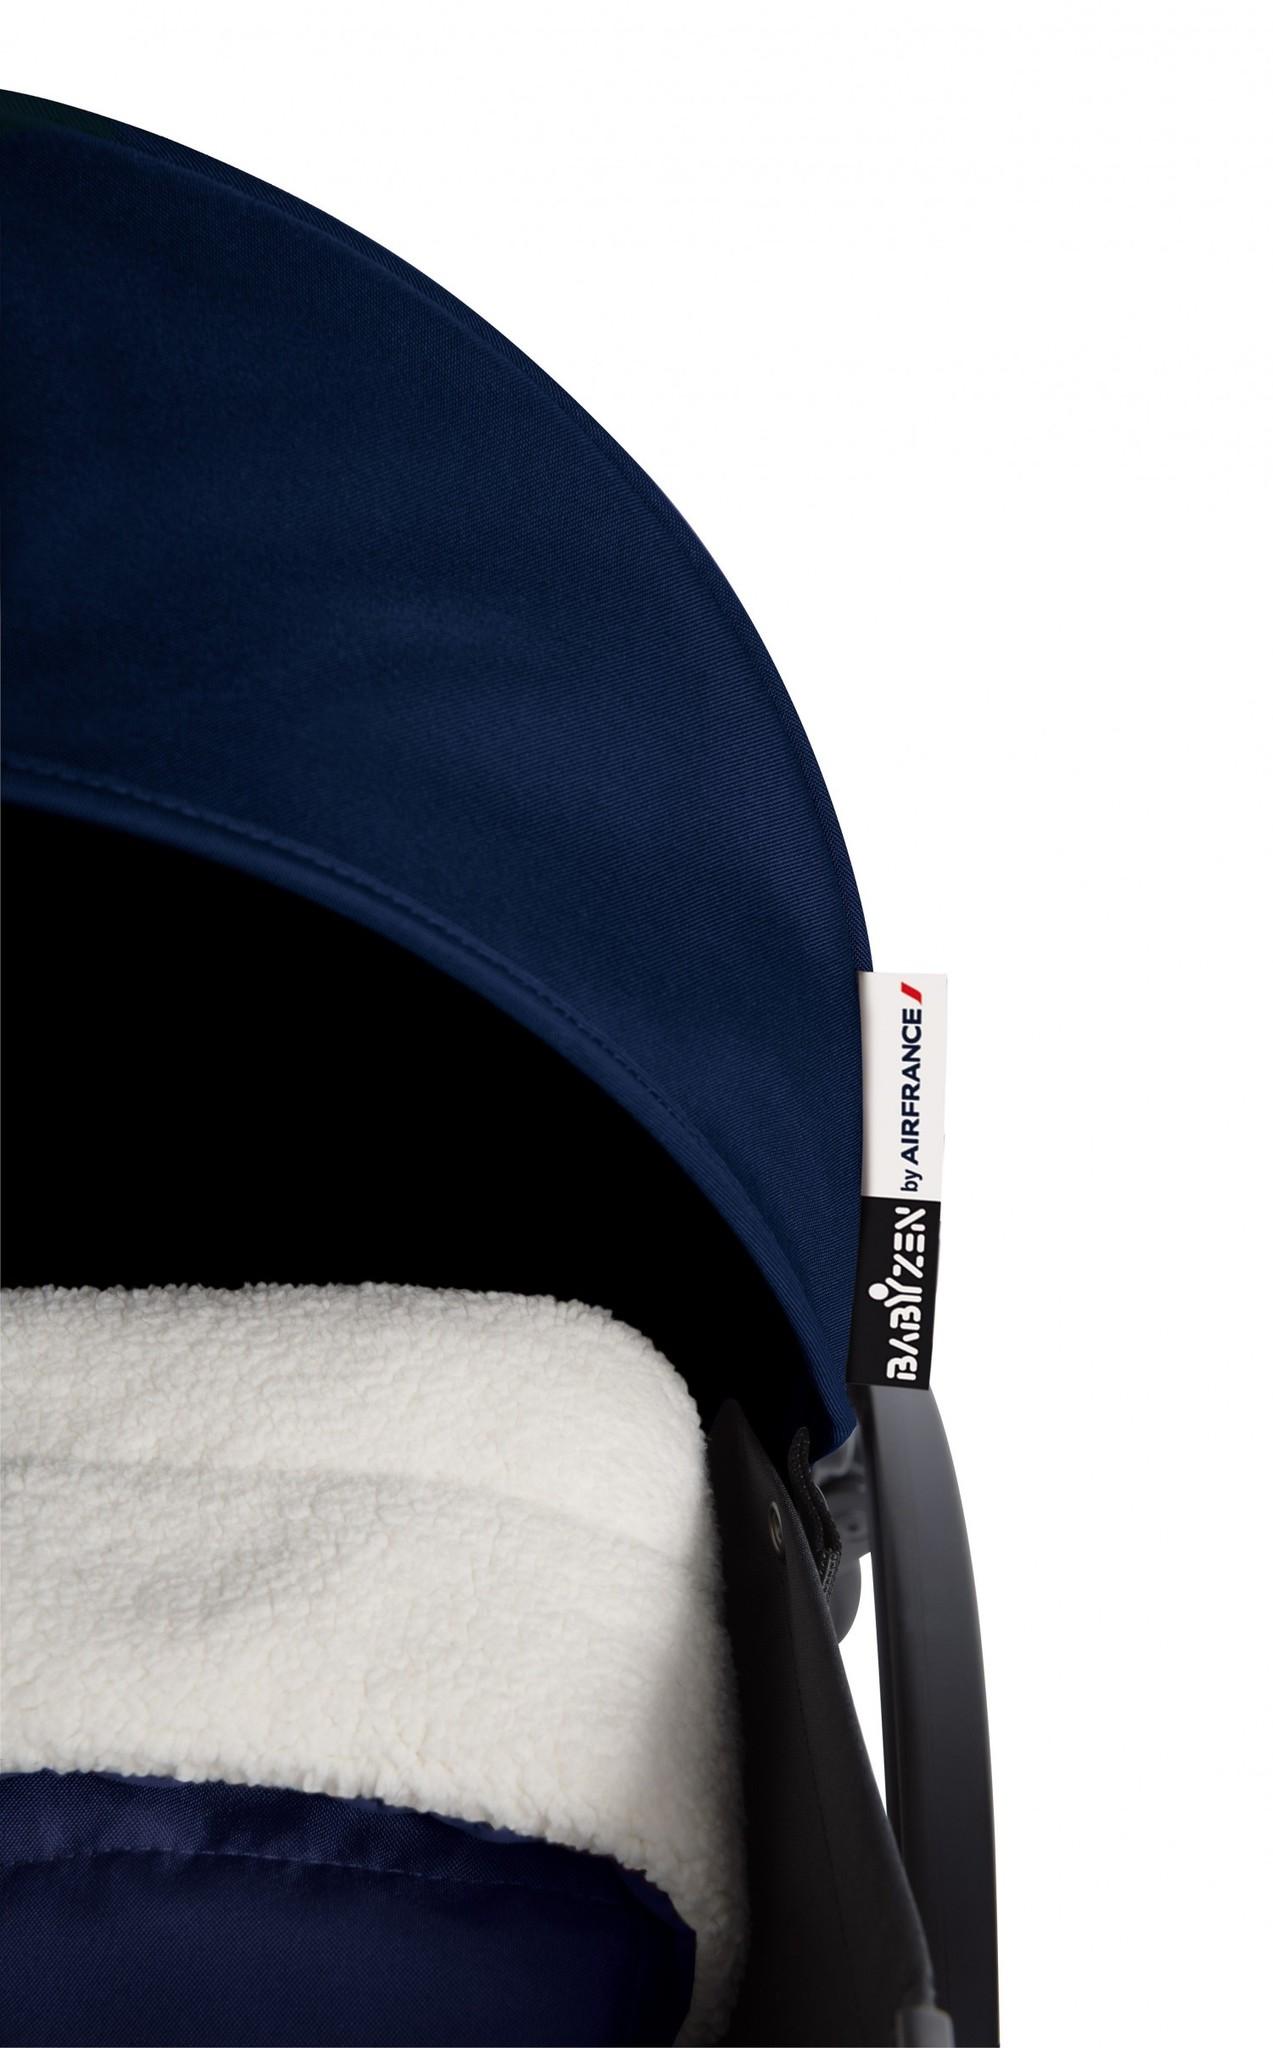 Babyzen Babyzen Yoyo 0+ Newborn Pack - Air France Blue 2020